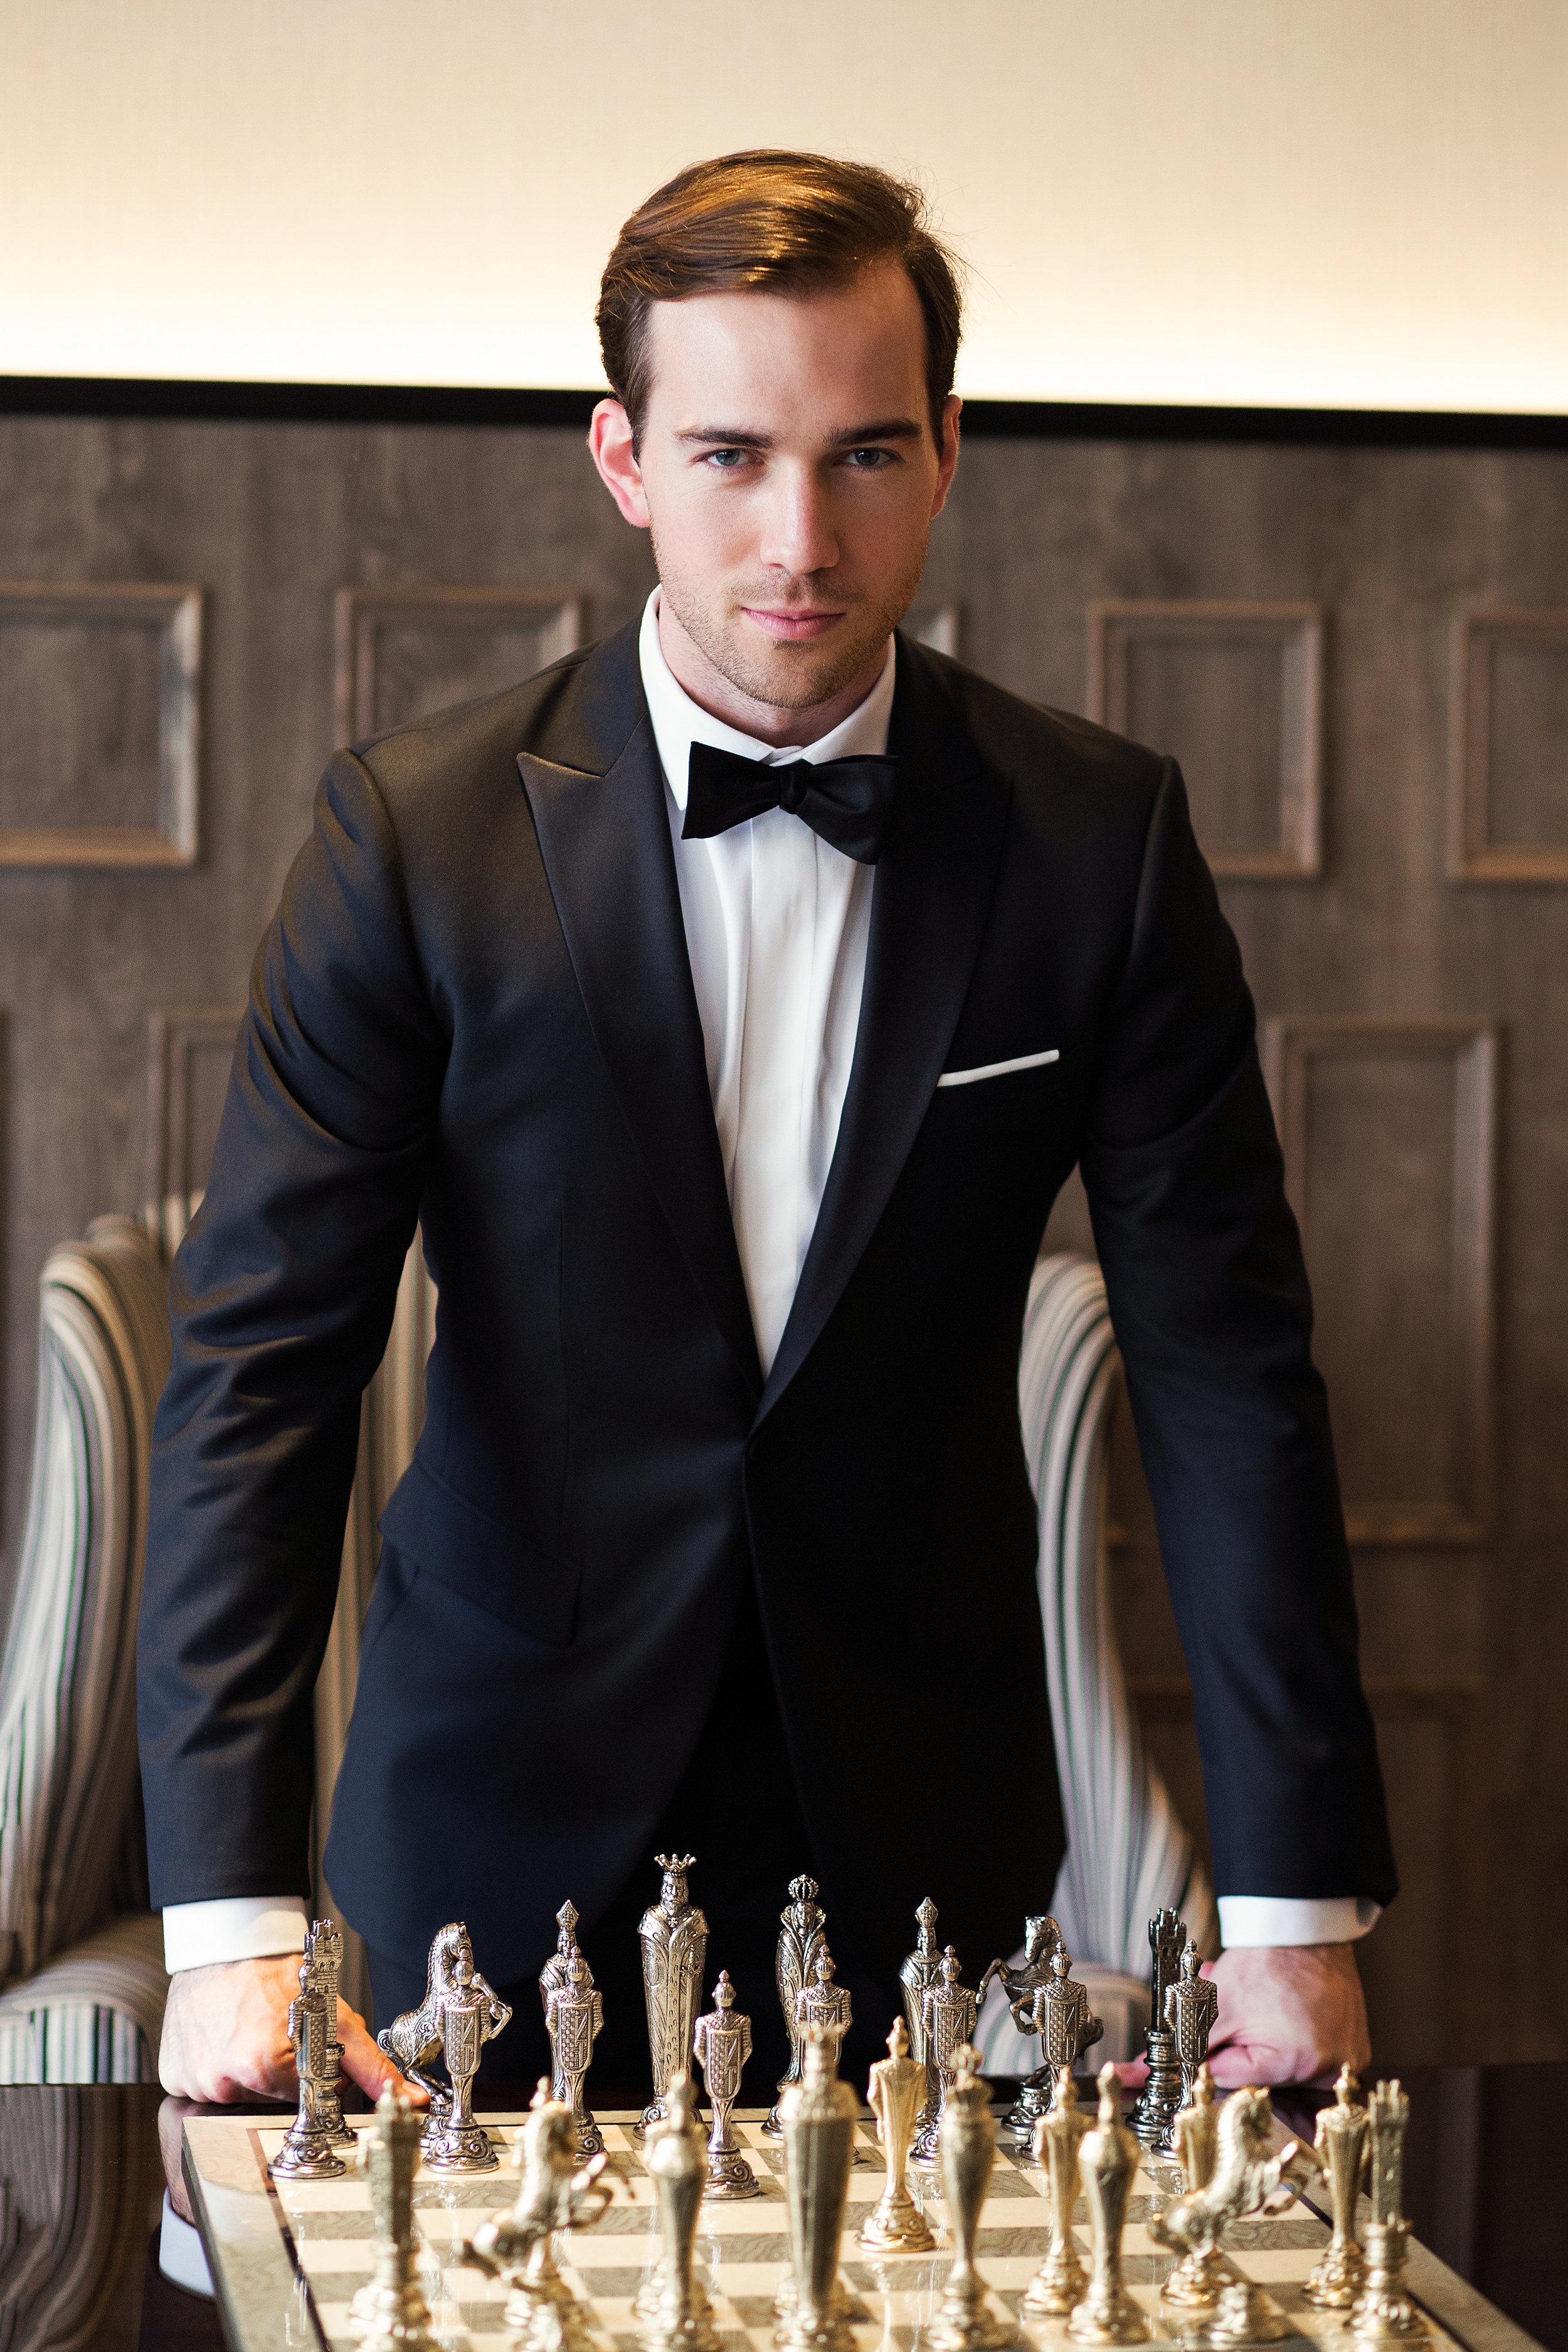 chris chess closeup.jpg